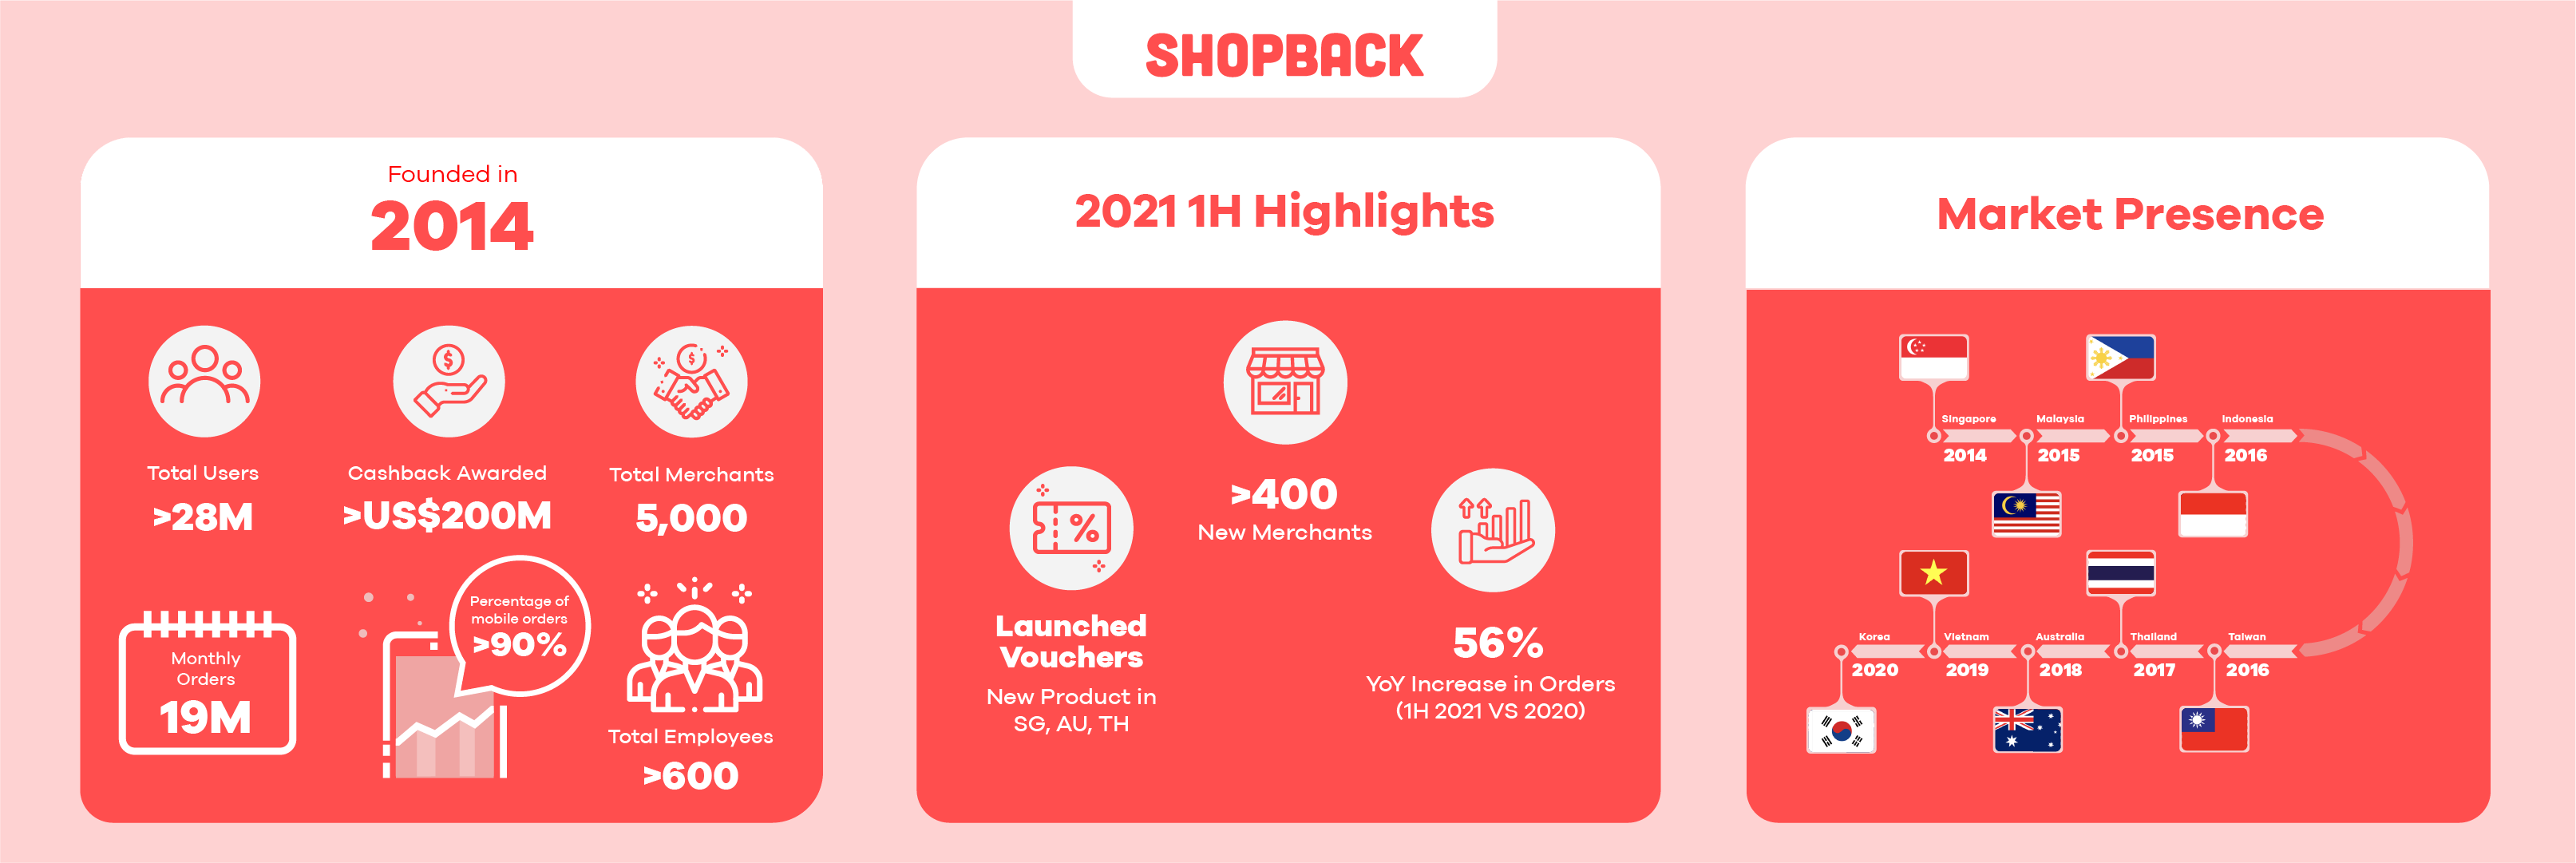 ShopBack info graphics